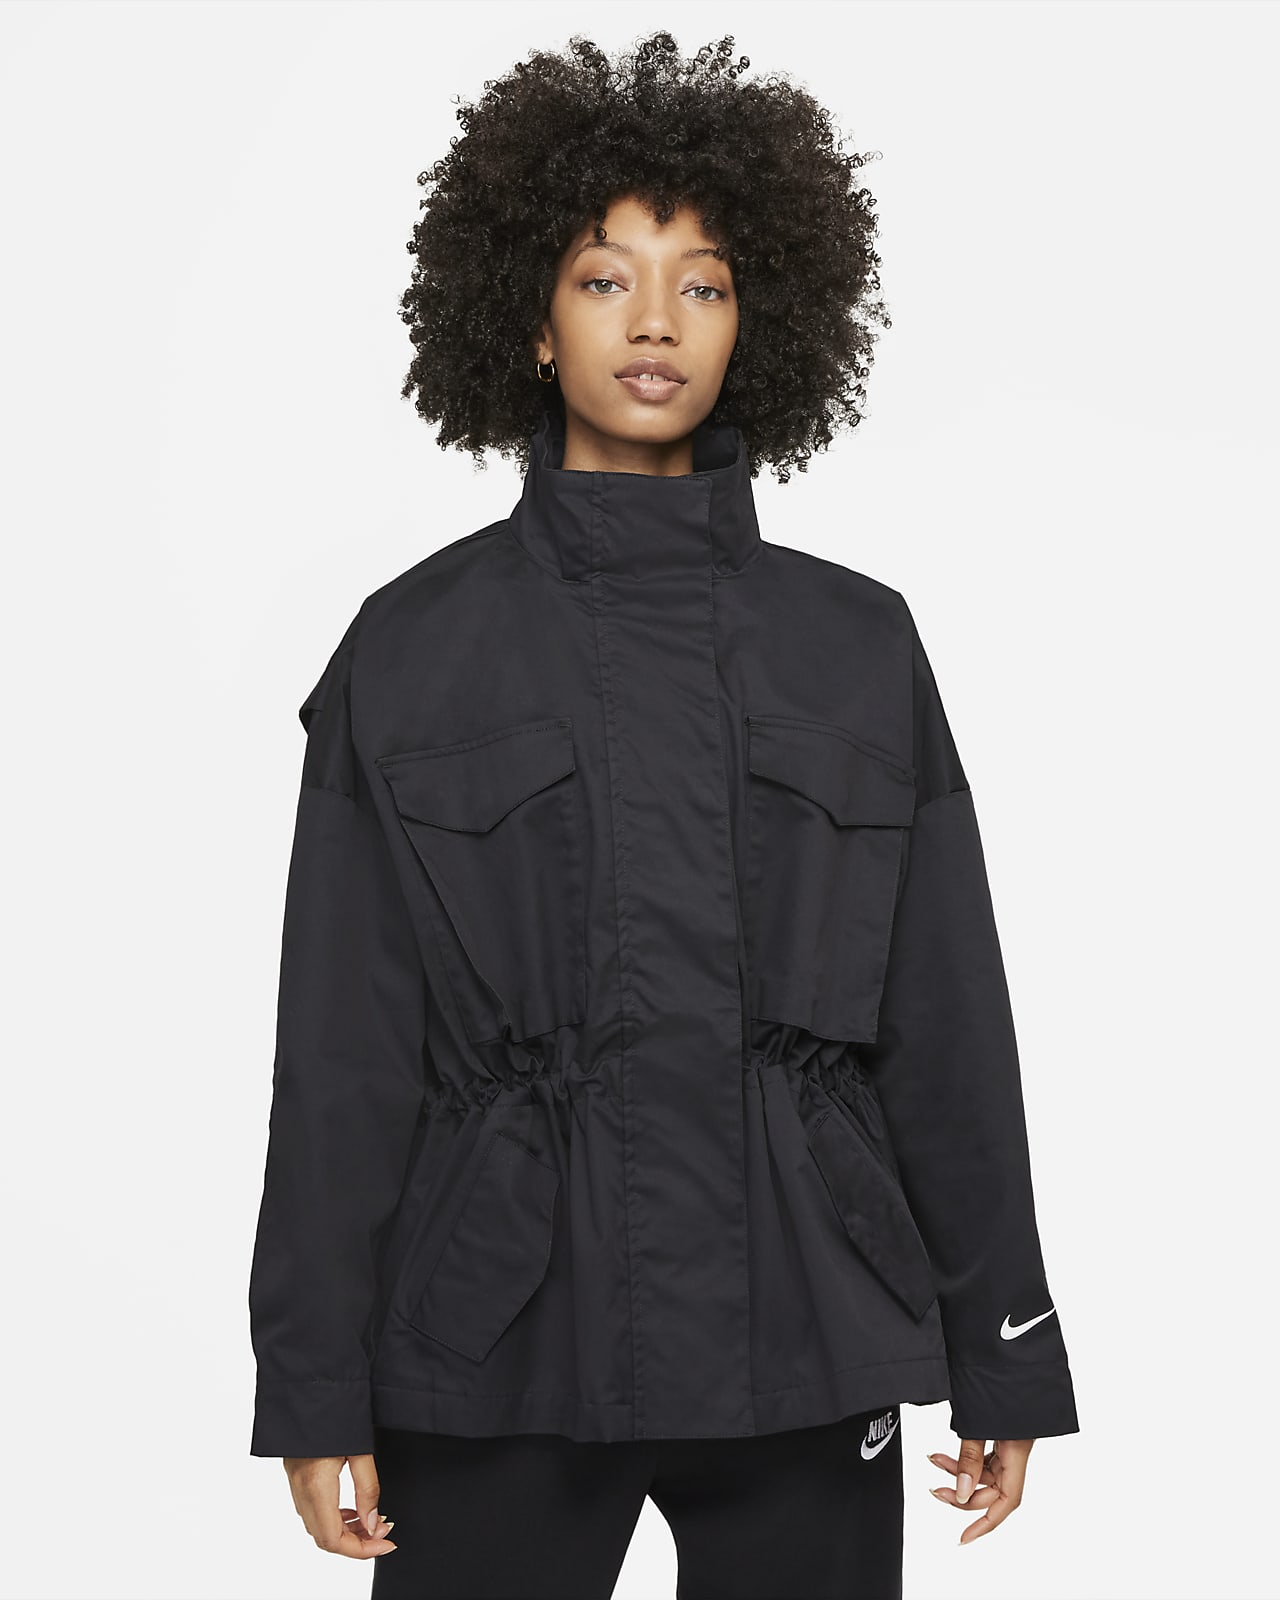 Nike Sportswear Collection Essentials Women's M65 Jacket